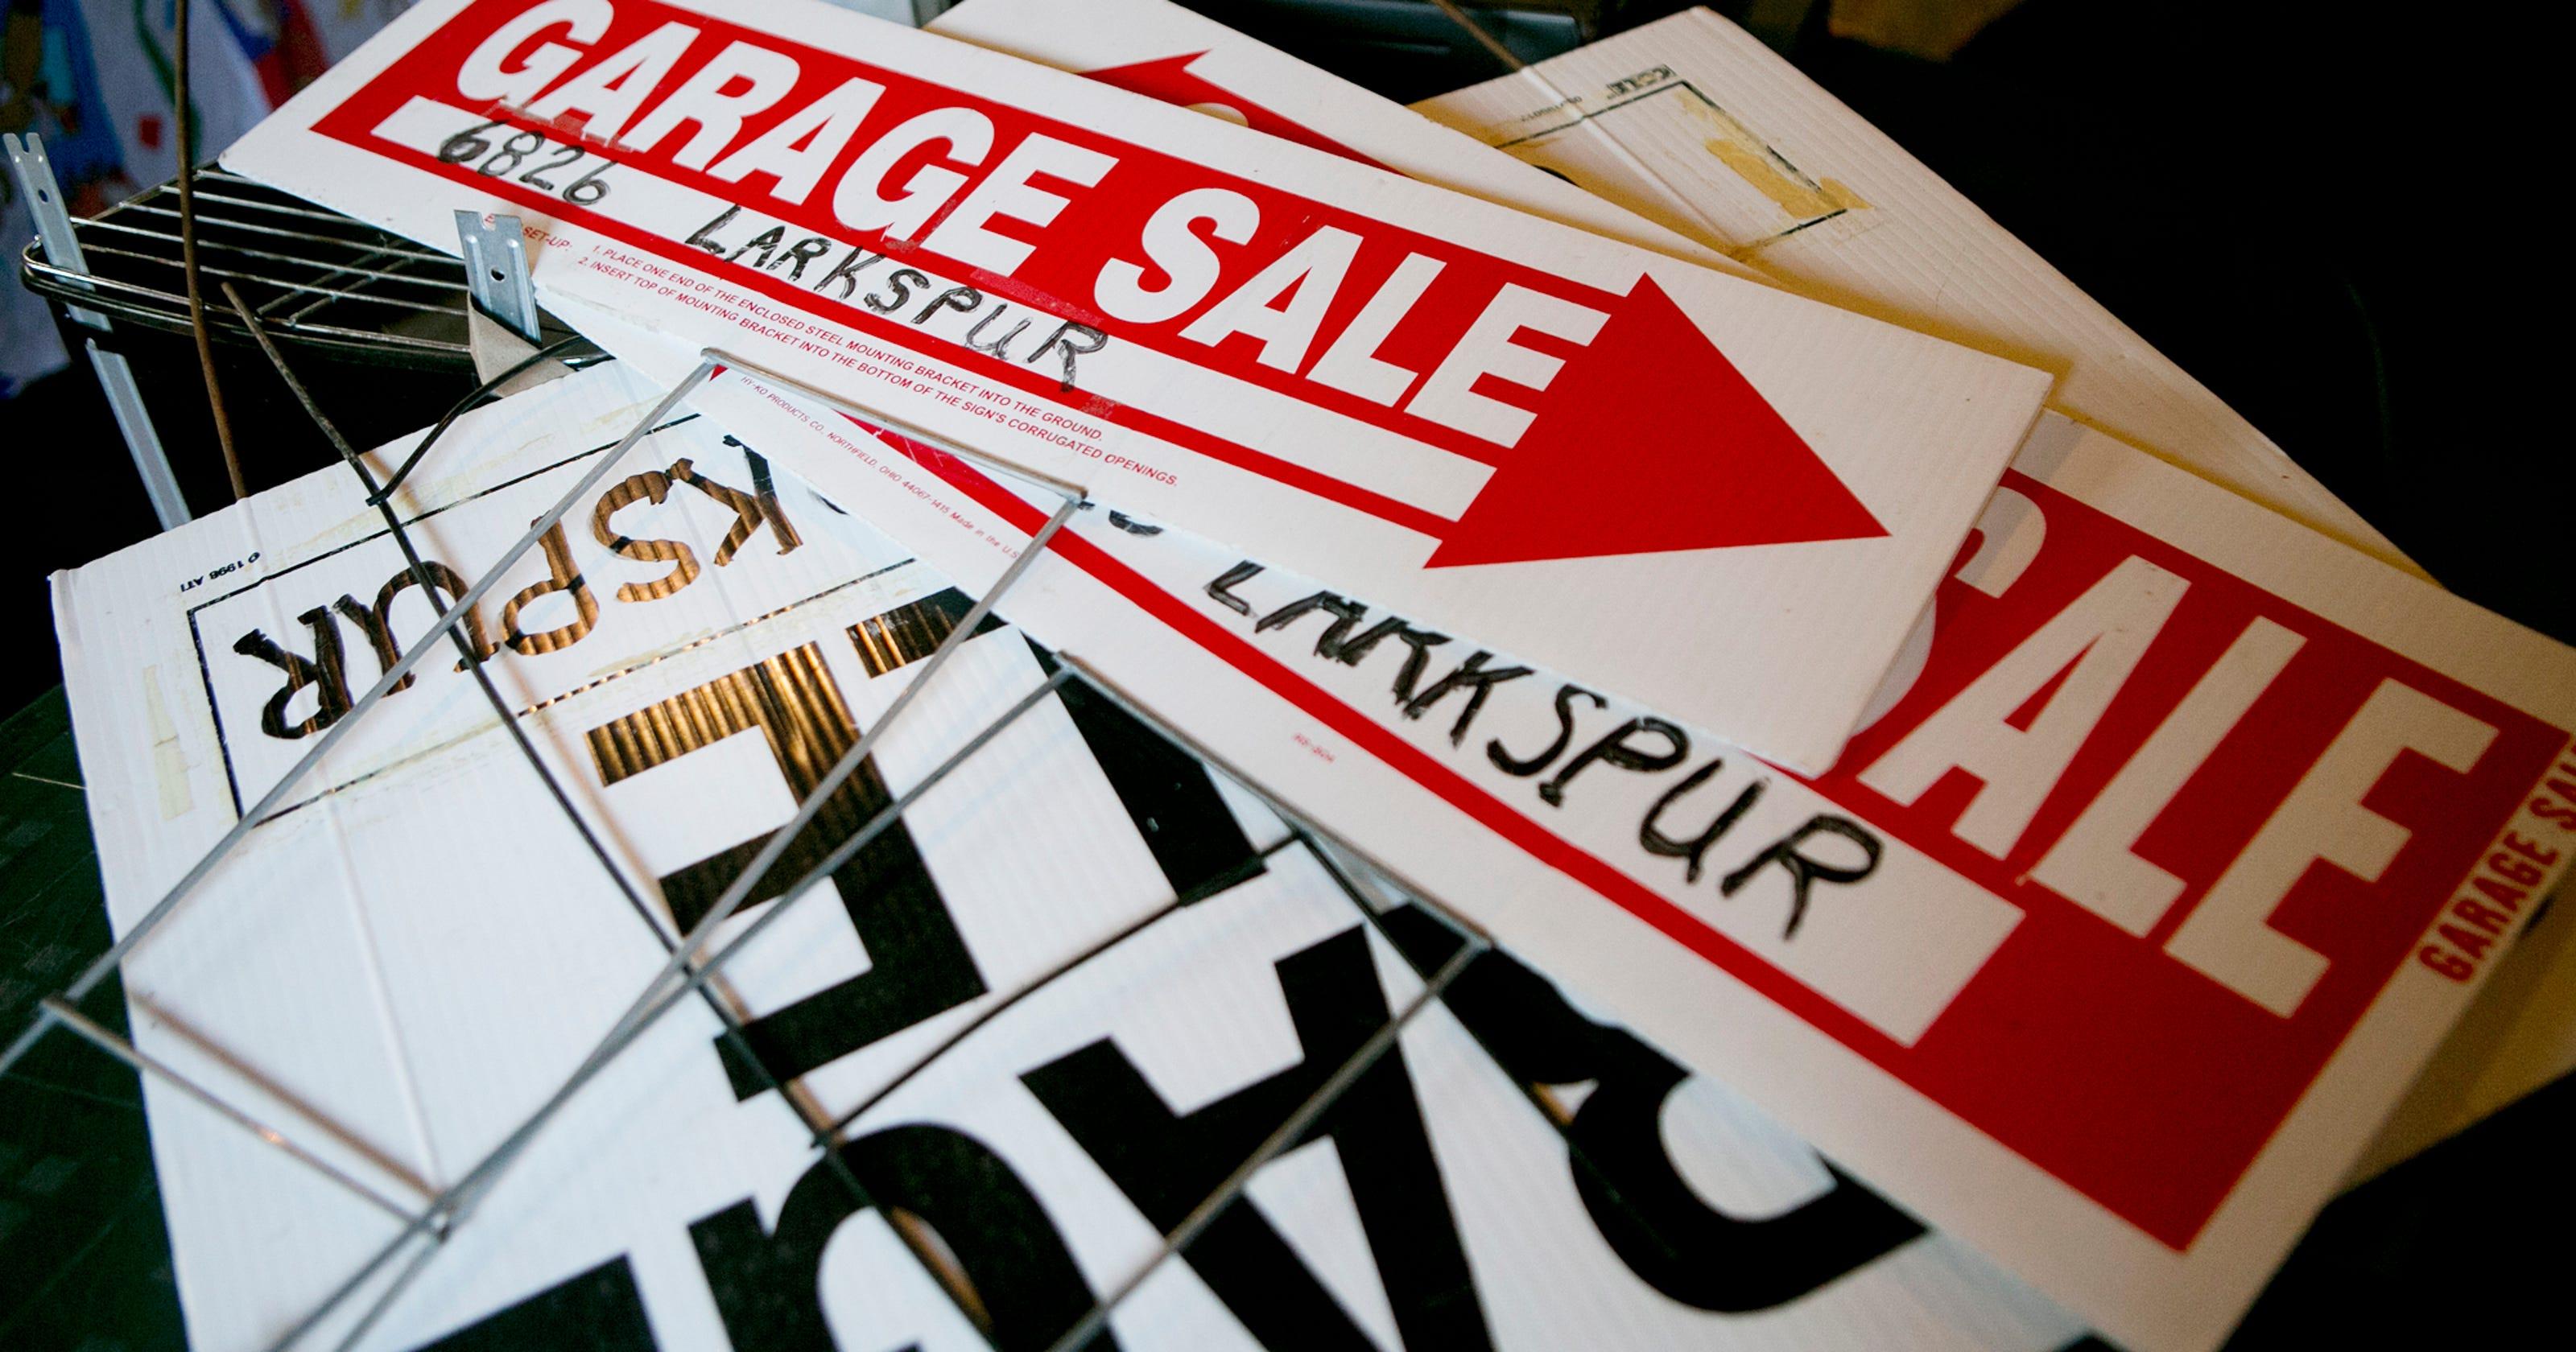 Community-wide rummage sales a hit in Wisconsin Rapids area